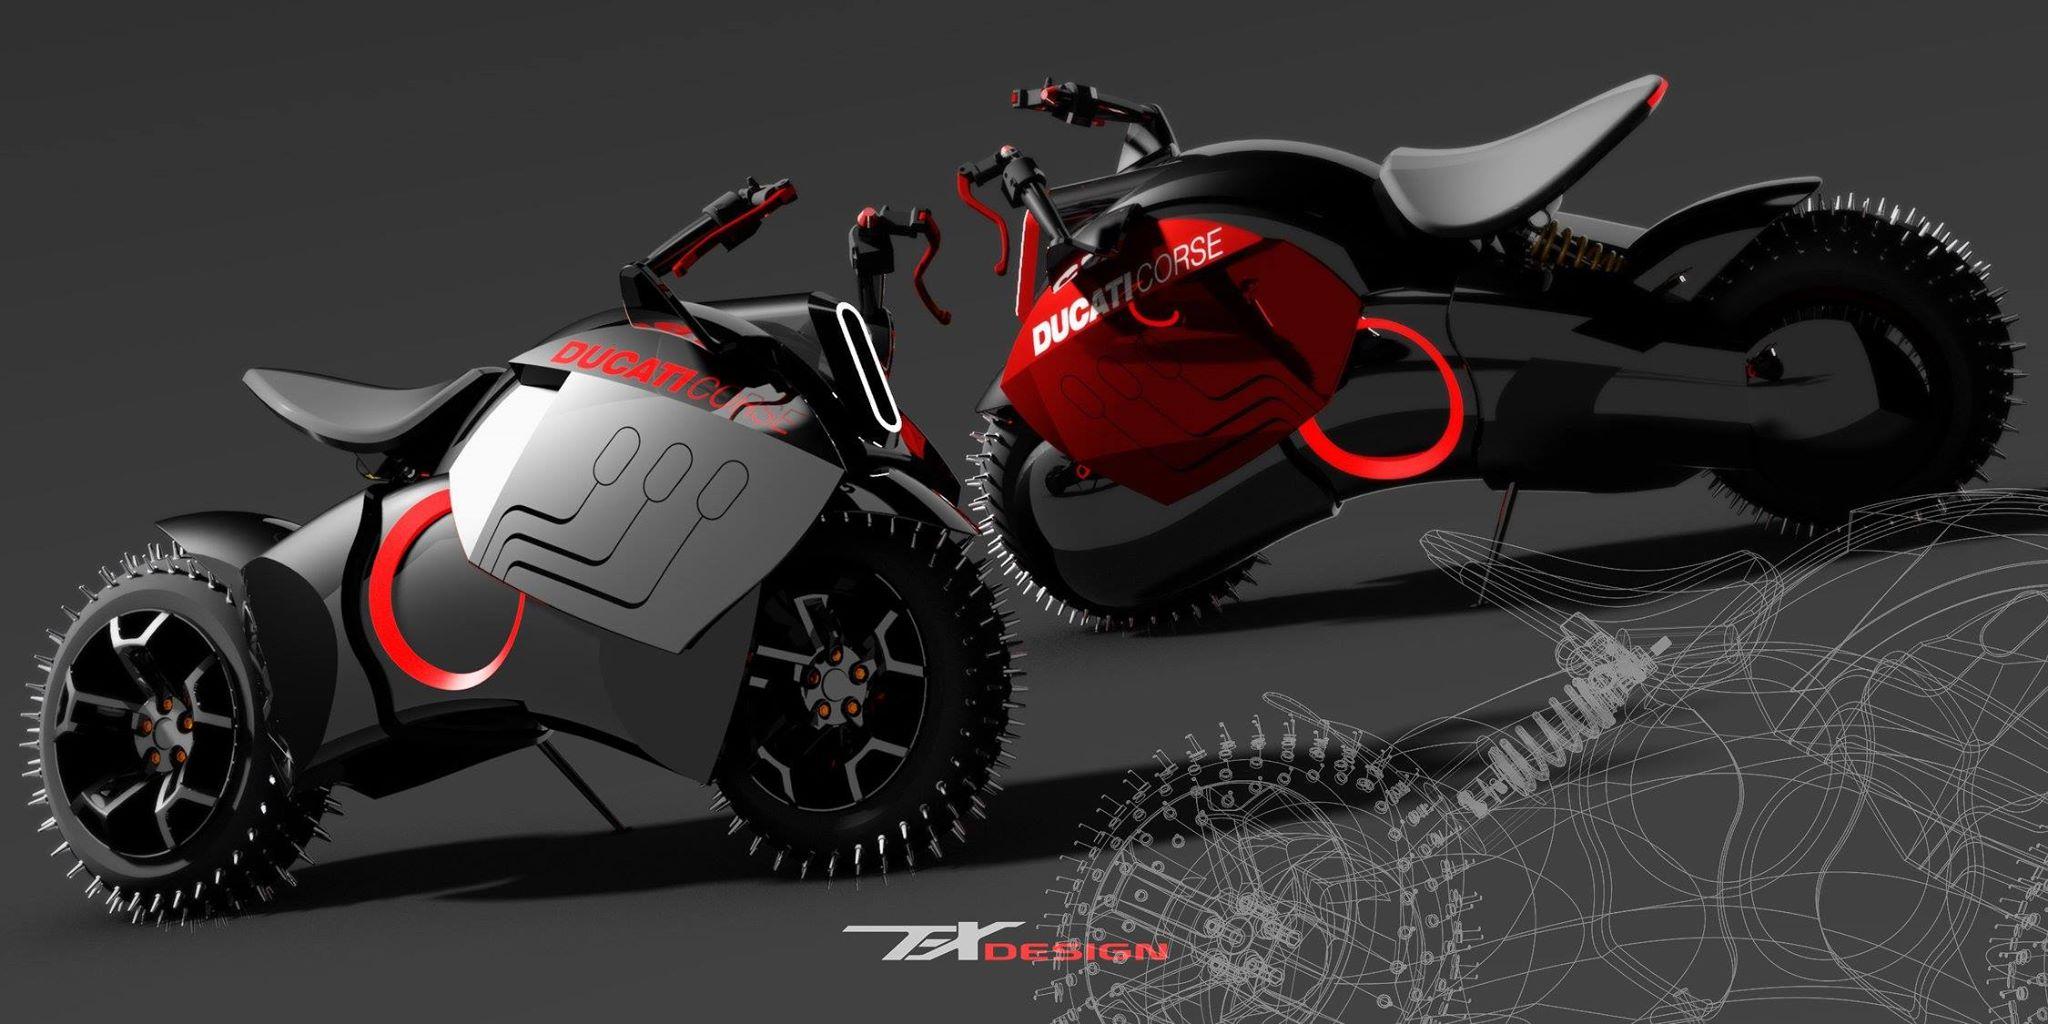 Is Ducati Worth The Money